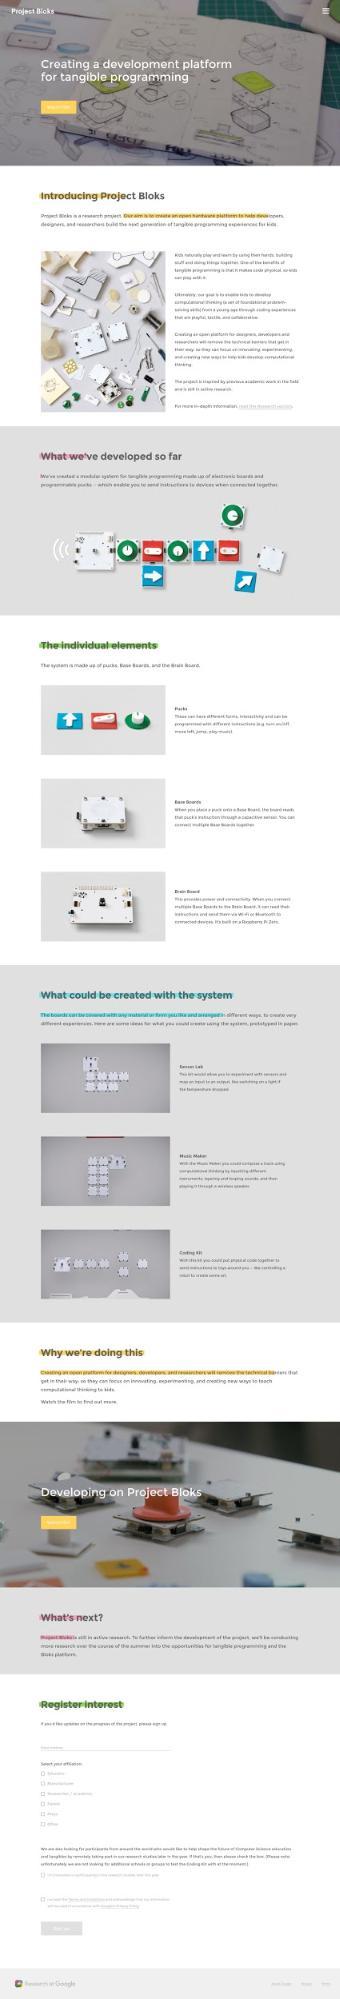 Google's Project Bloks website